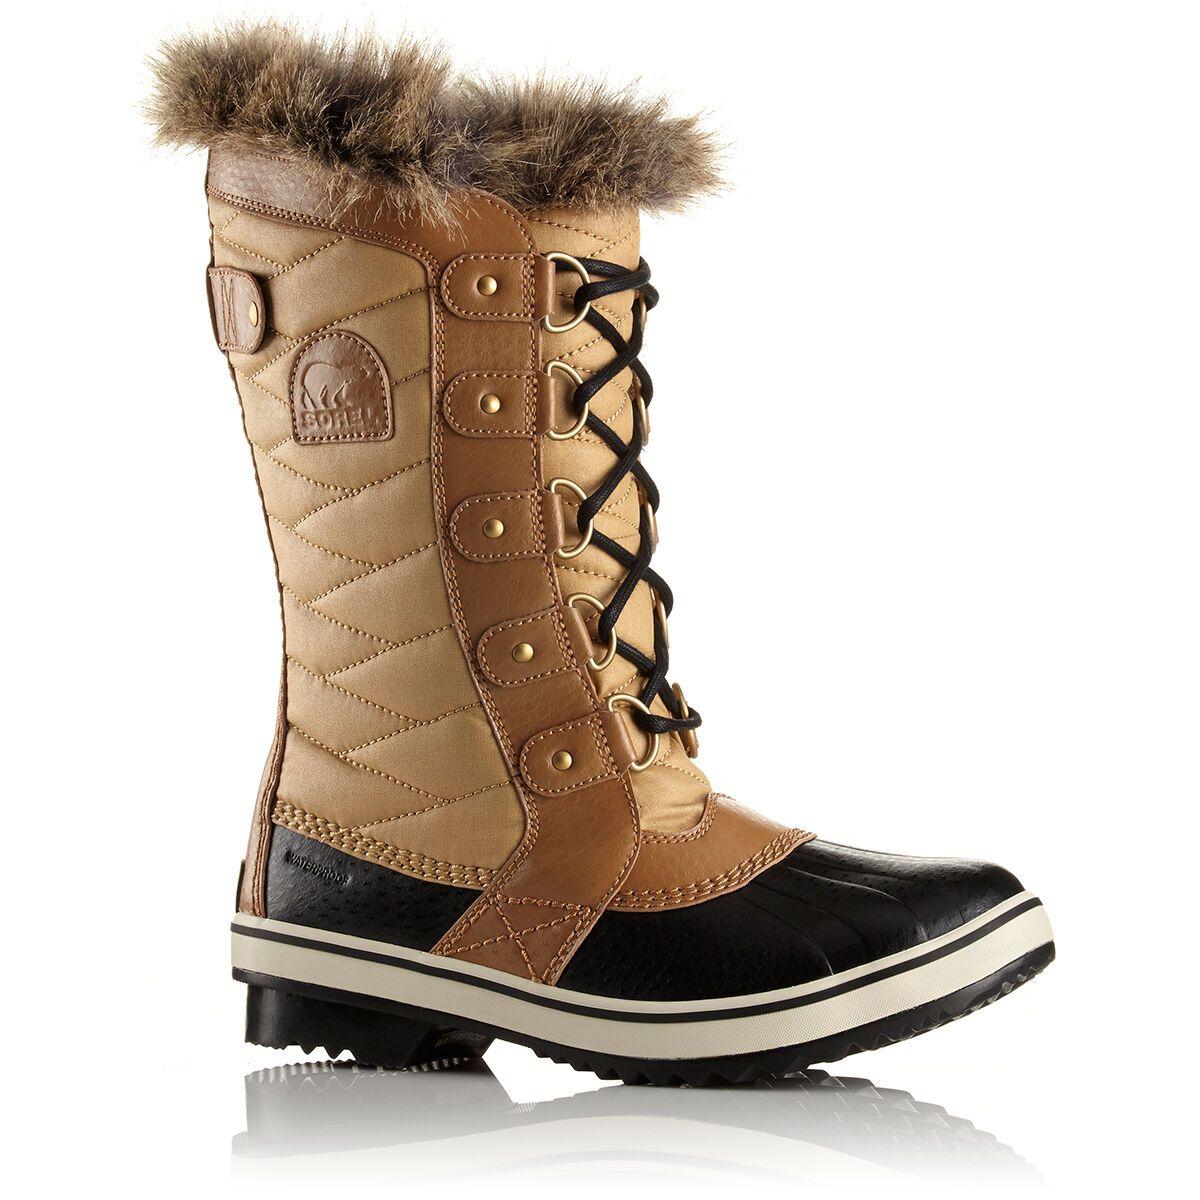 SOREL Women's Tofino II Boots, Curry in